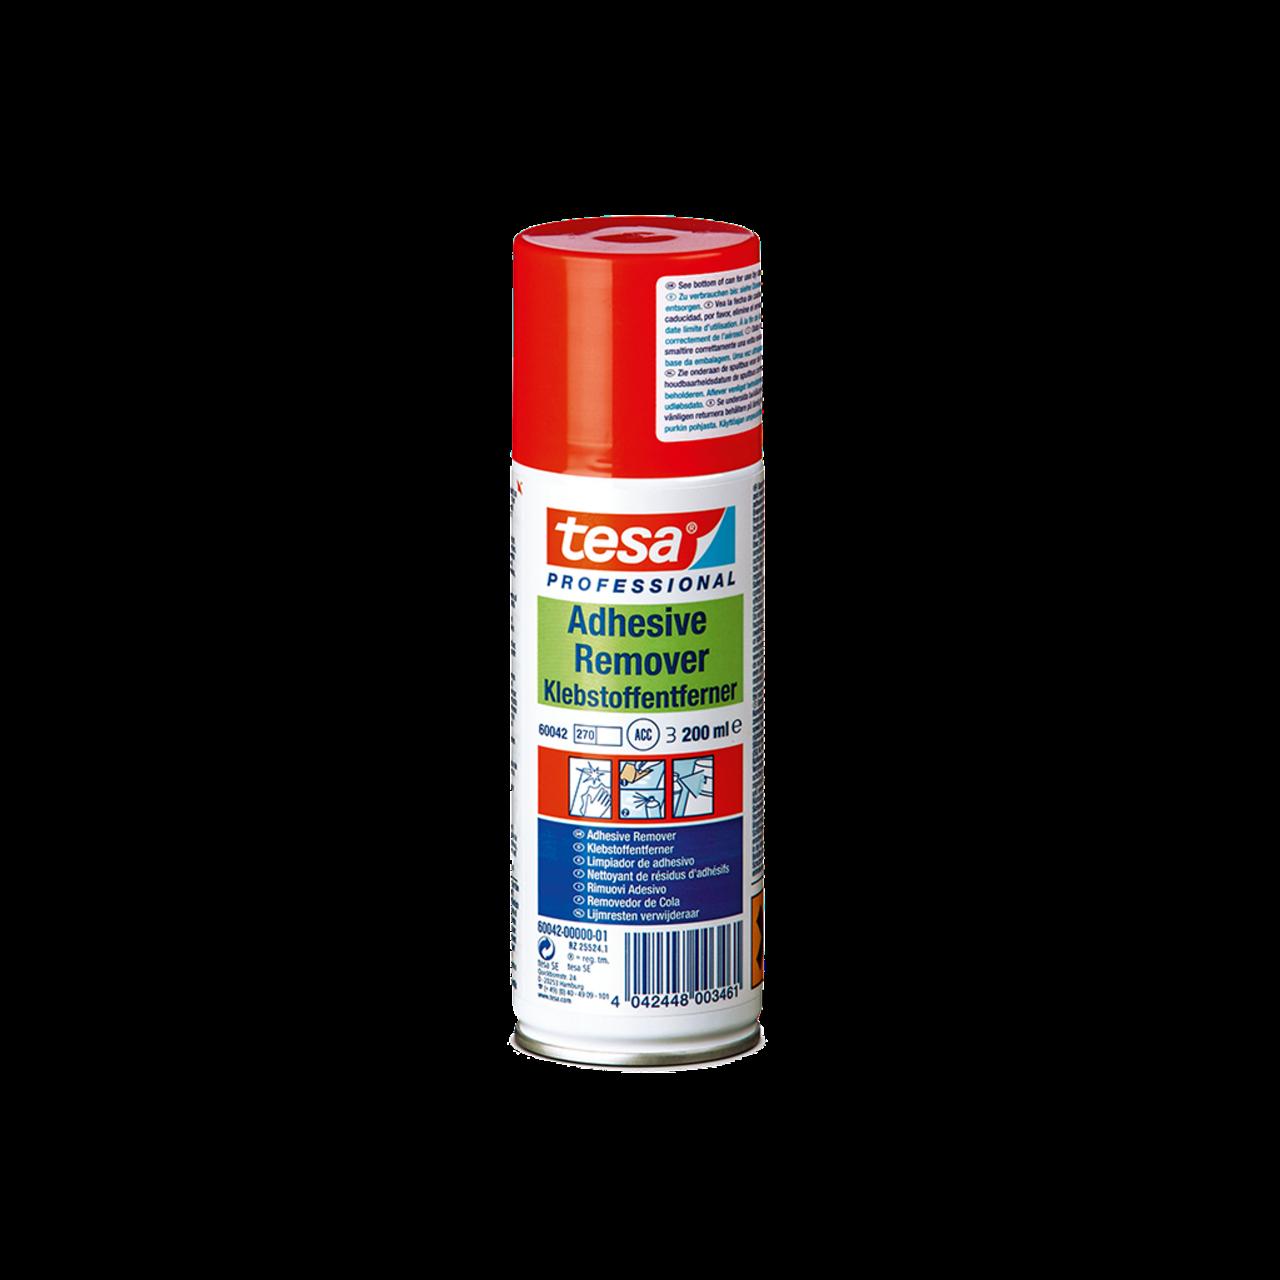 tesa 60042, Klebstoffentferner Spray, 200ml, farblos